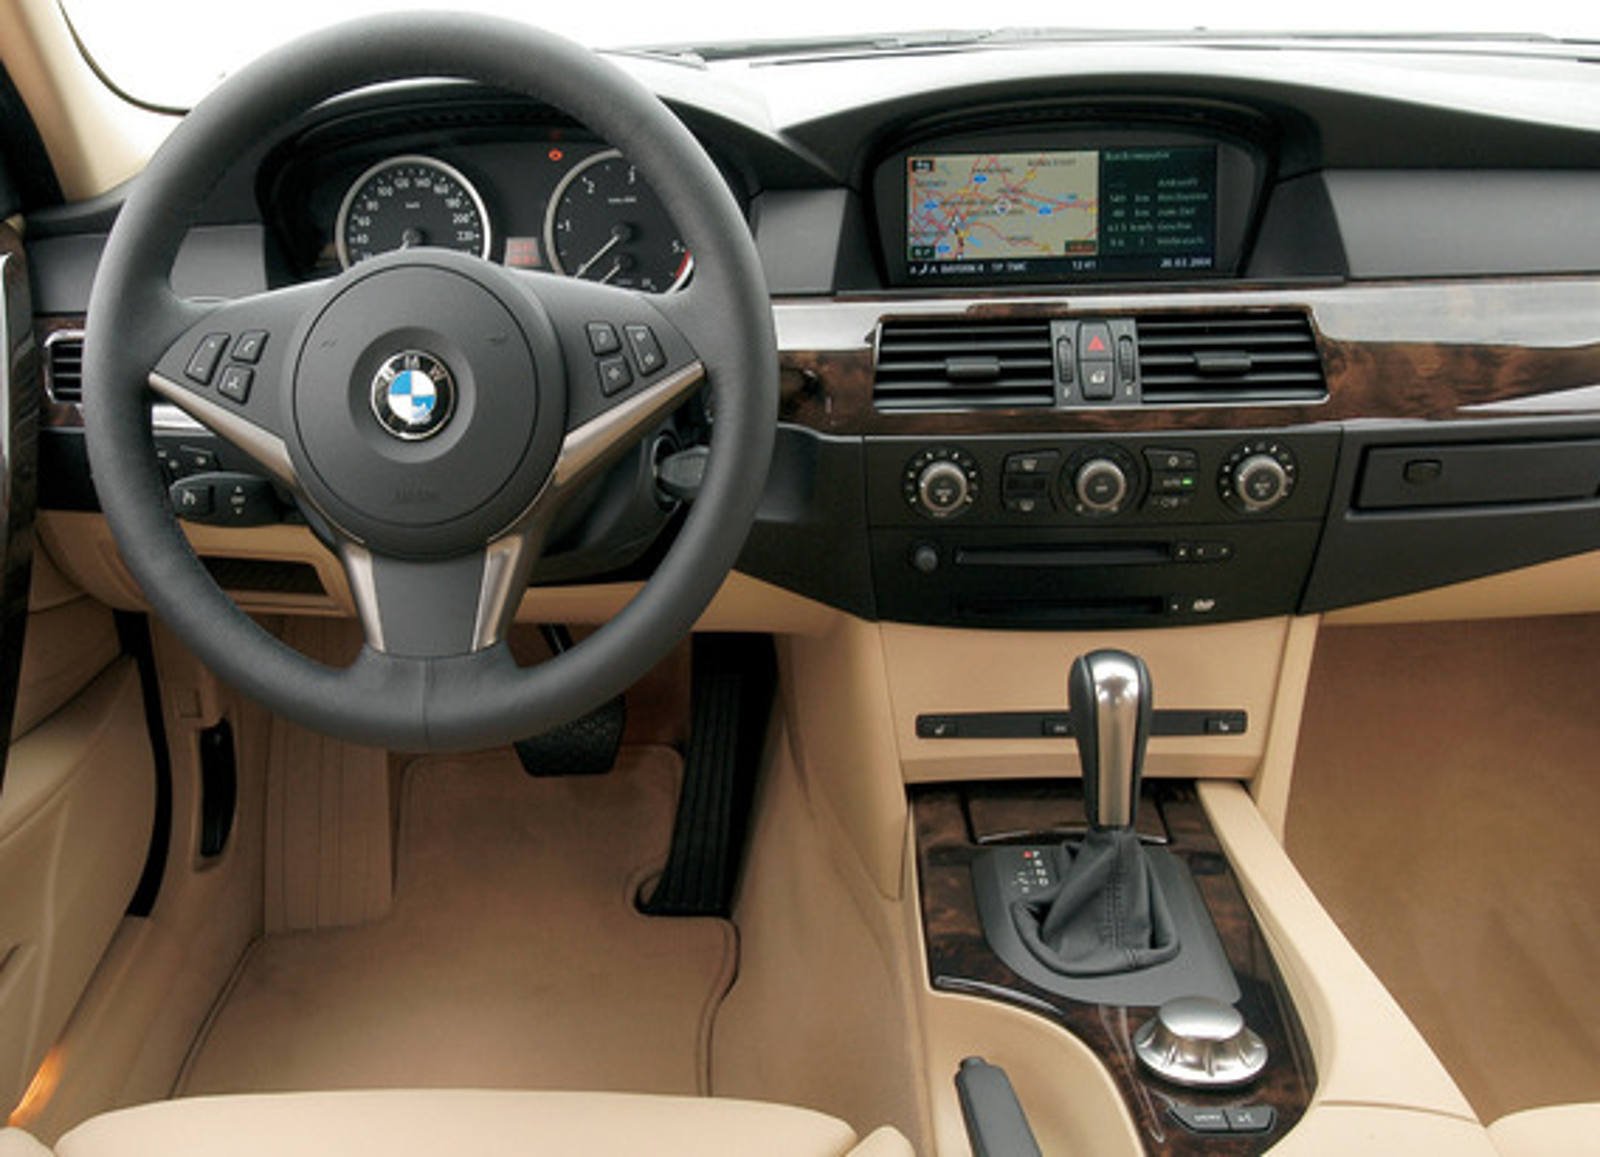 Что означает предупреждение «Coolant level is too low» в BMW 5 E60